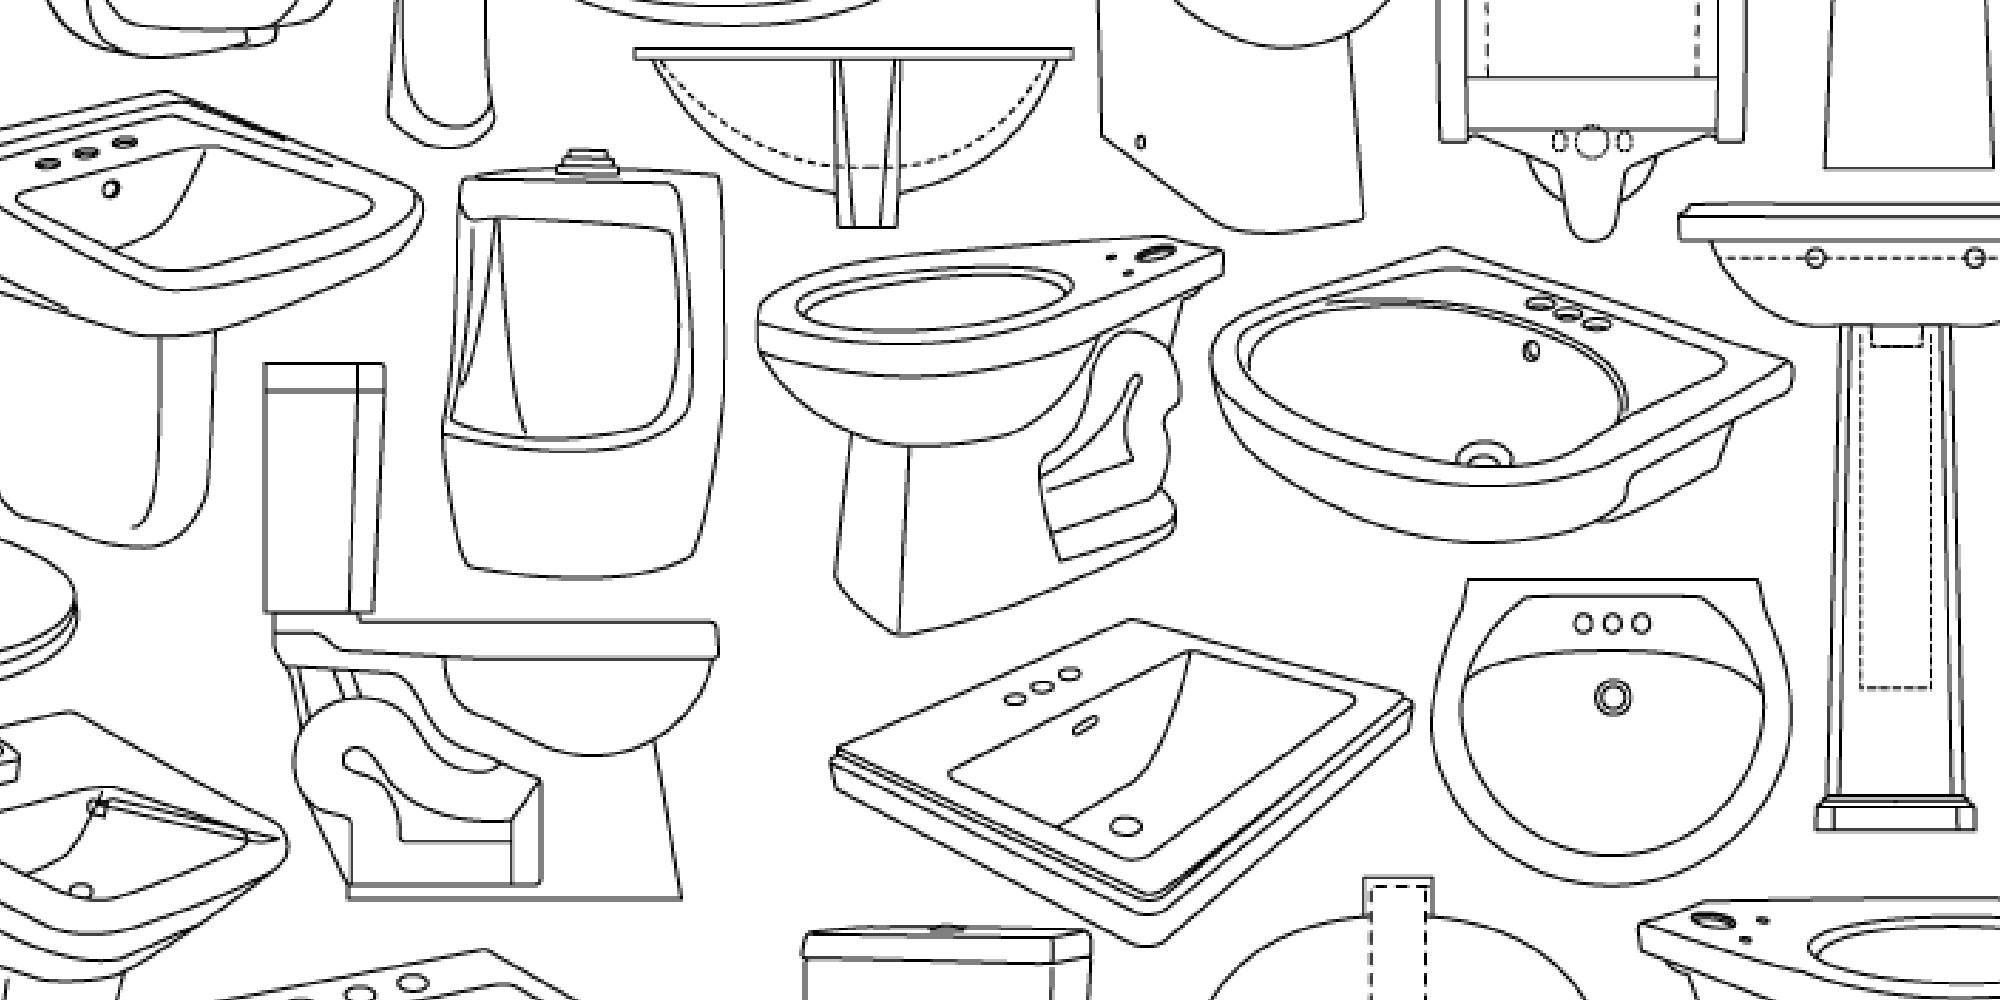 Contrac Sketches of Bathroom Plumbing